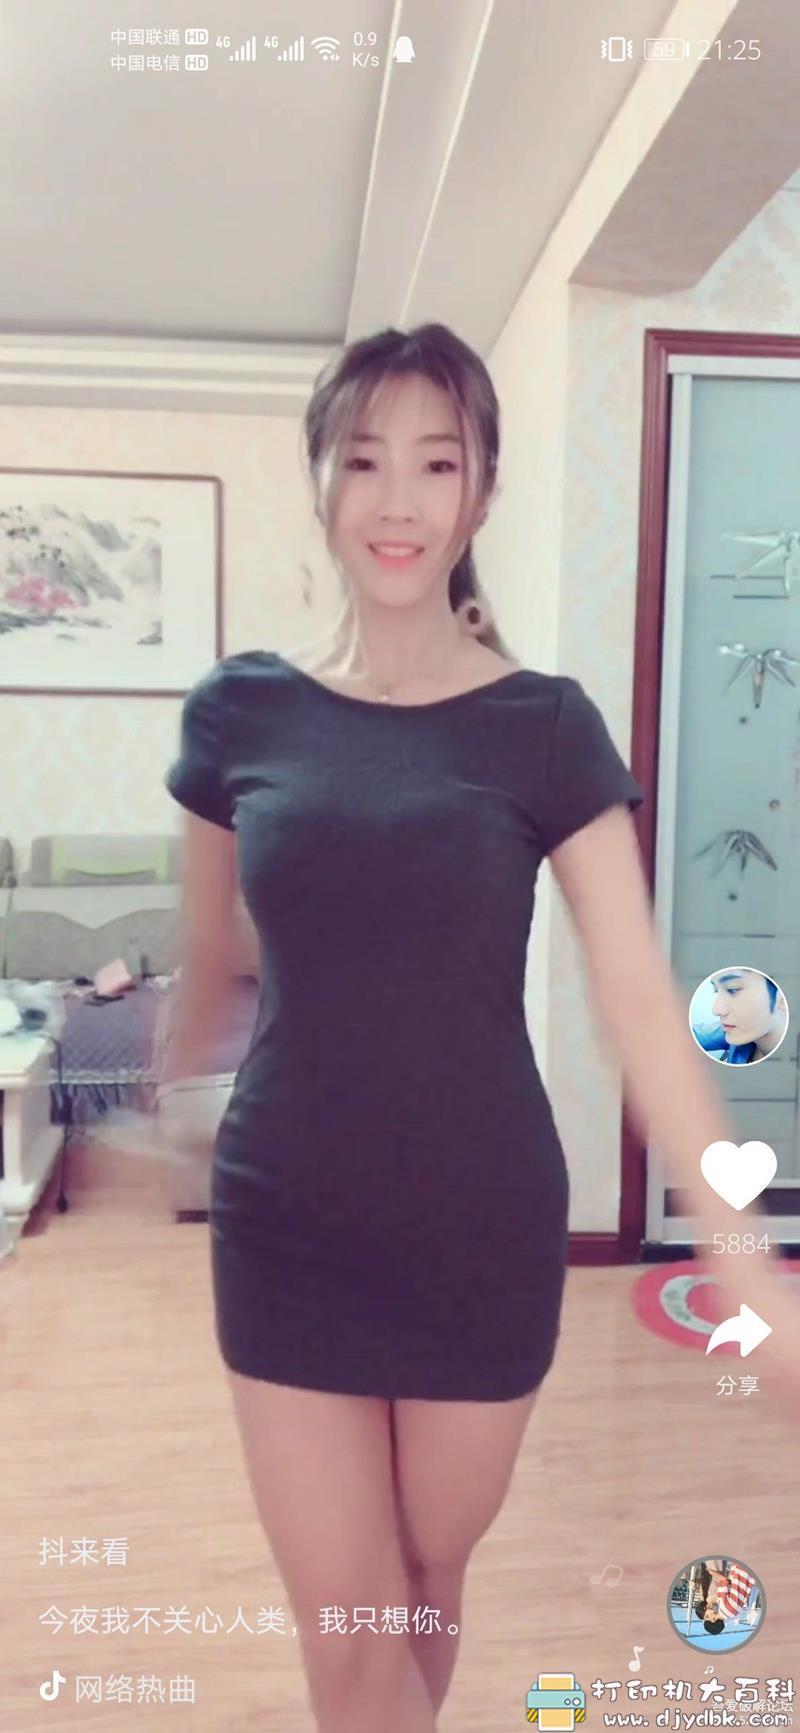 [Android]专看漂亮小姐姐扭动(跳舞)的app【抖来看】 配图 No.1